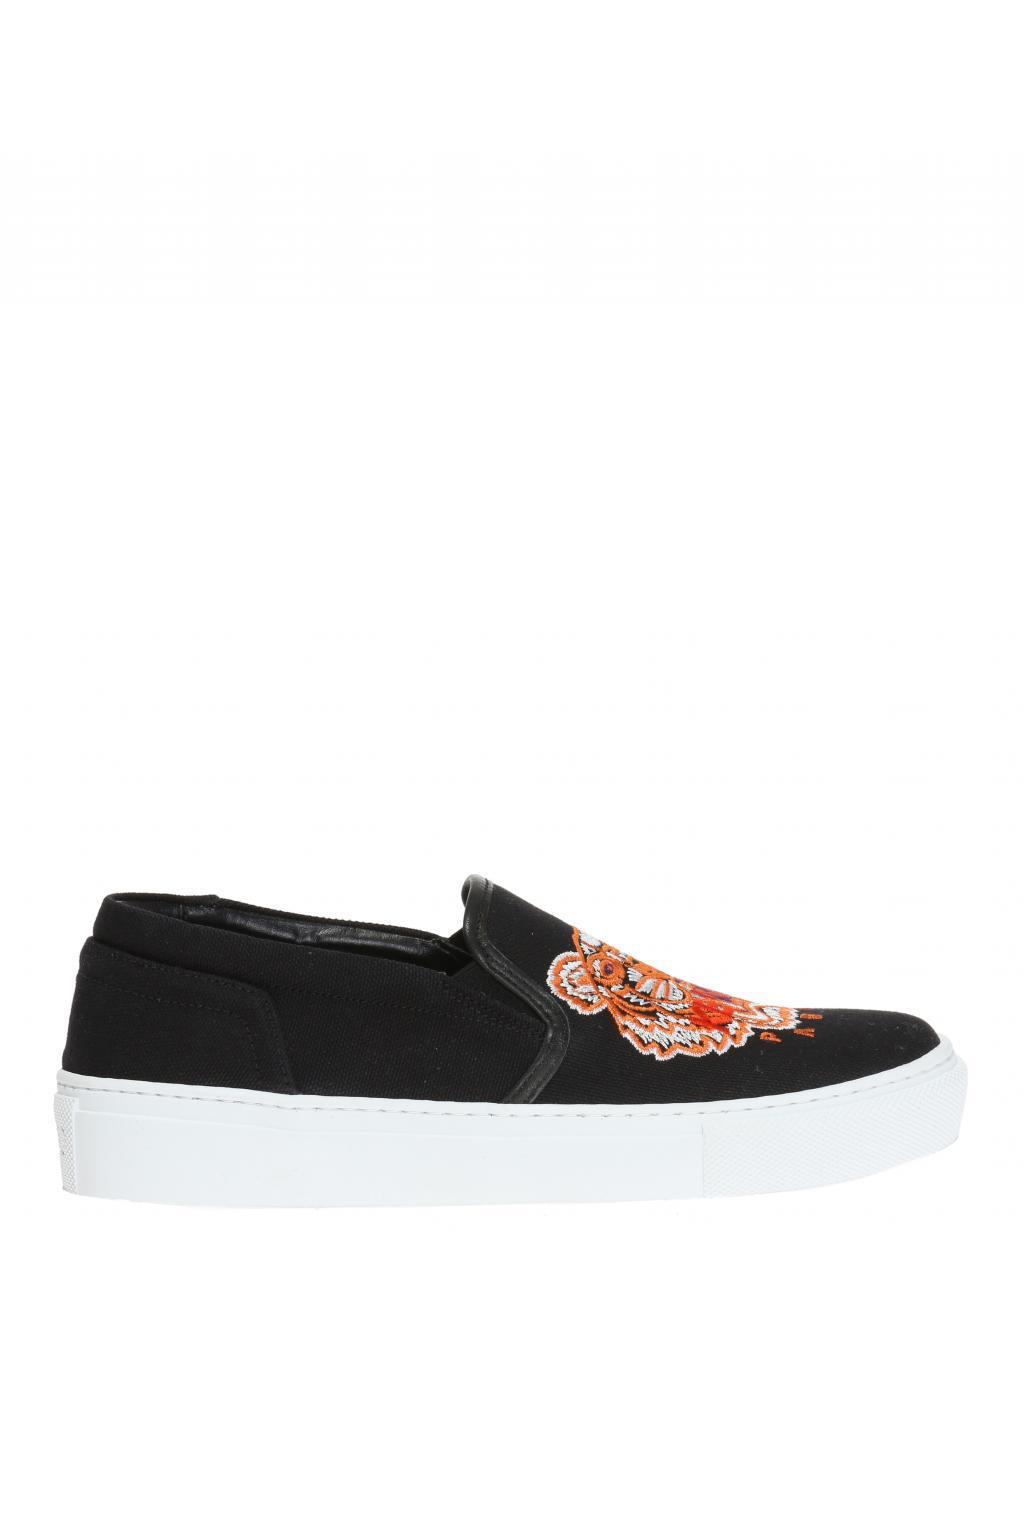 KENZO. Women's Black 'tiger' Platform Slip-on Sneakers